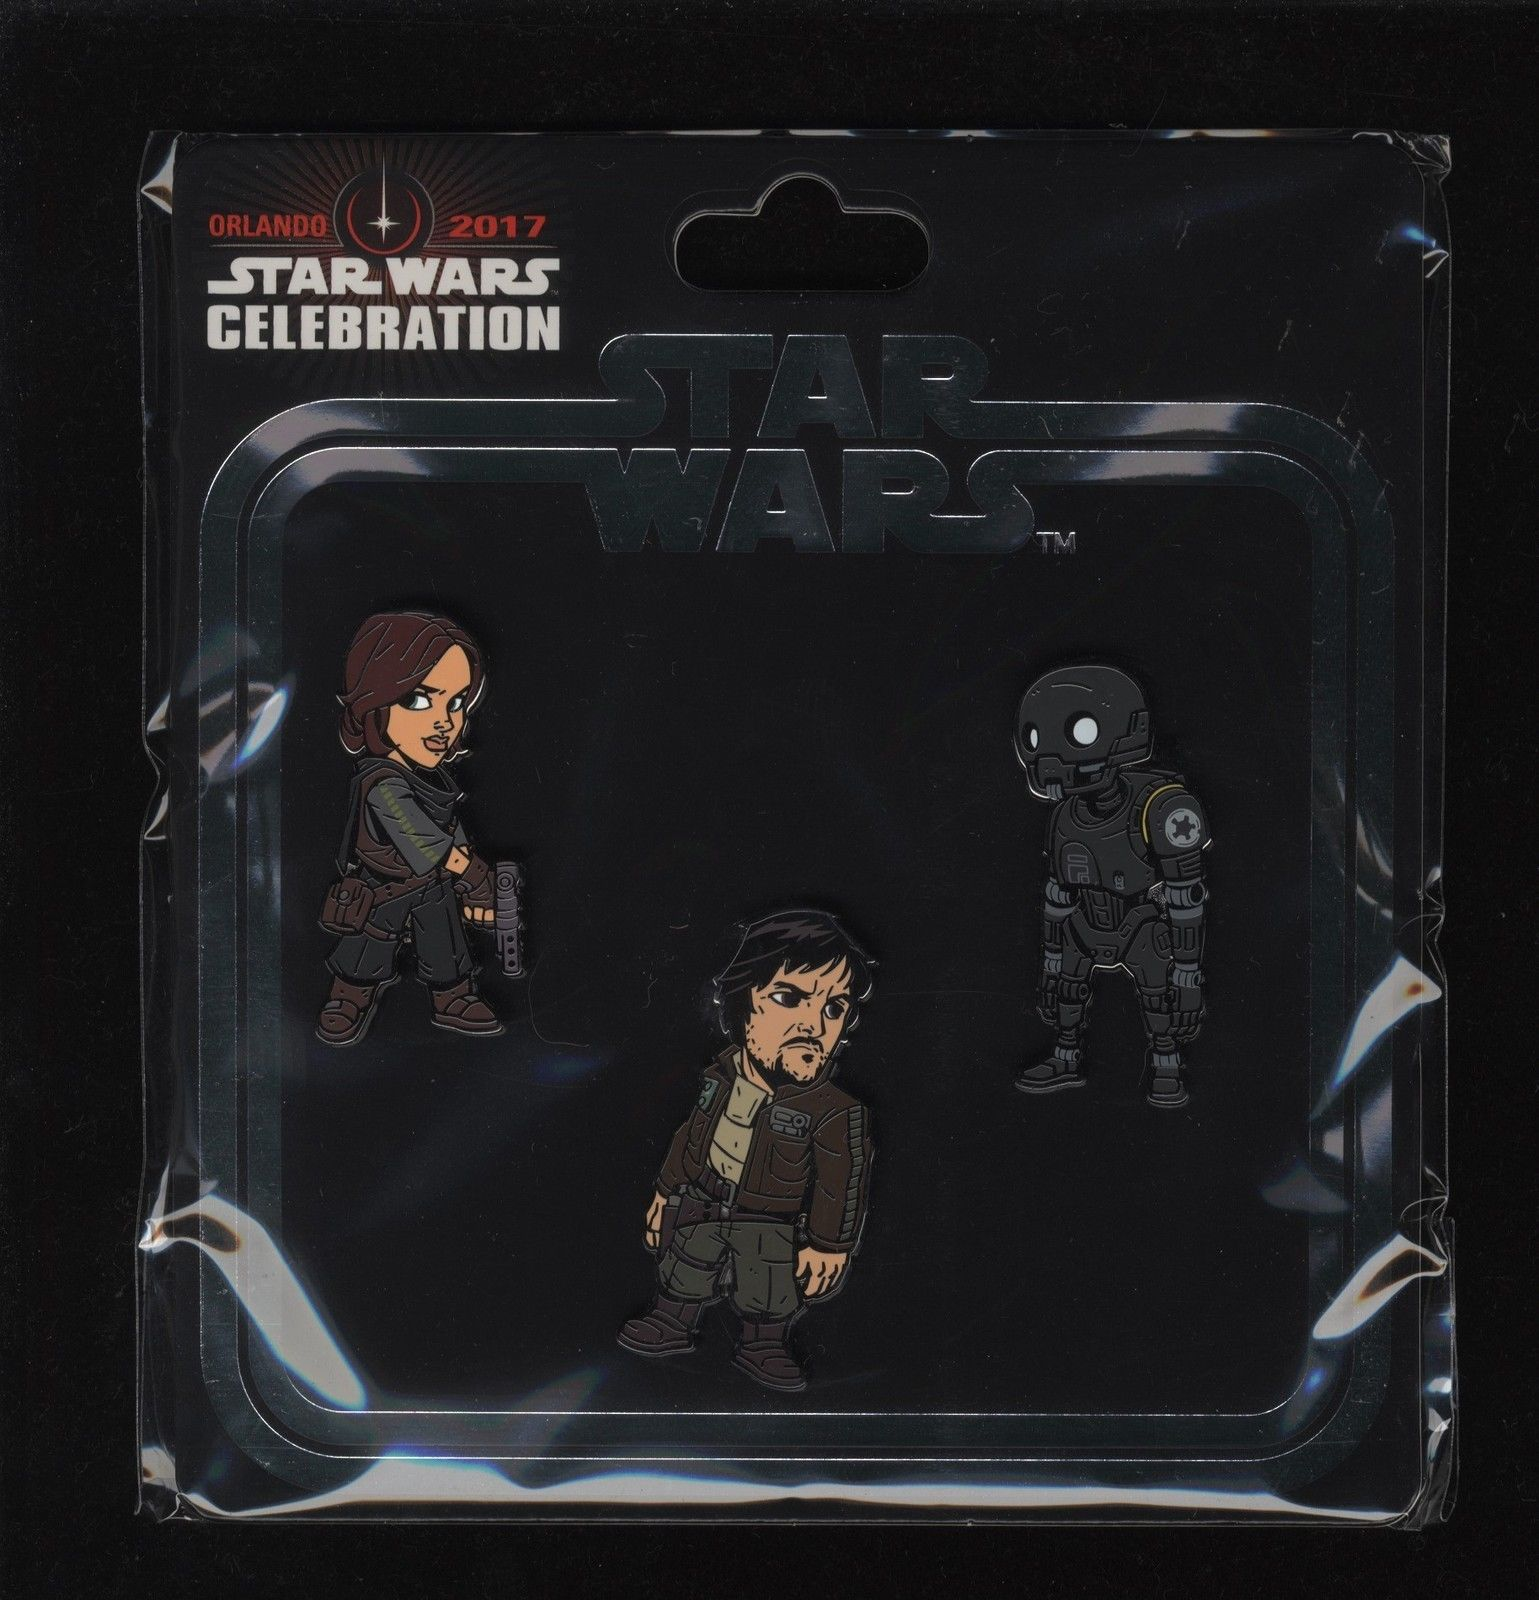 Star Wars Celebration Orlando 2017 Rogue One Jyn Erso Cassian Andor K-2SO